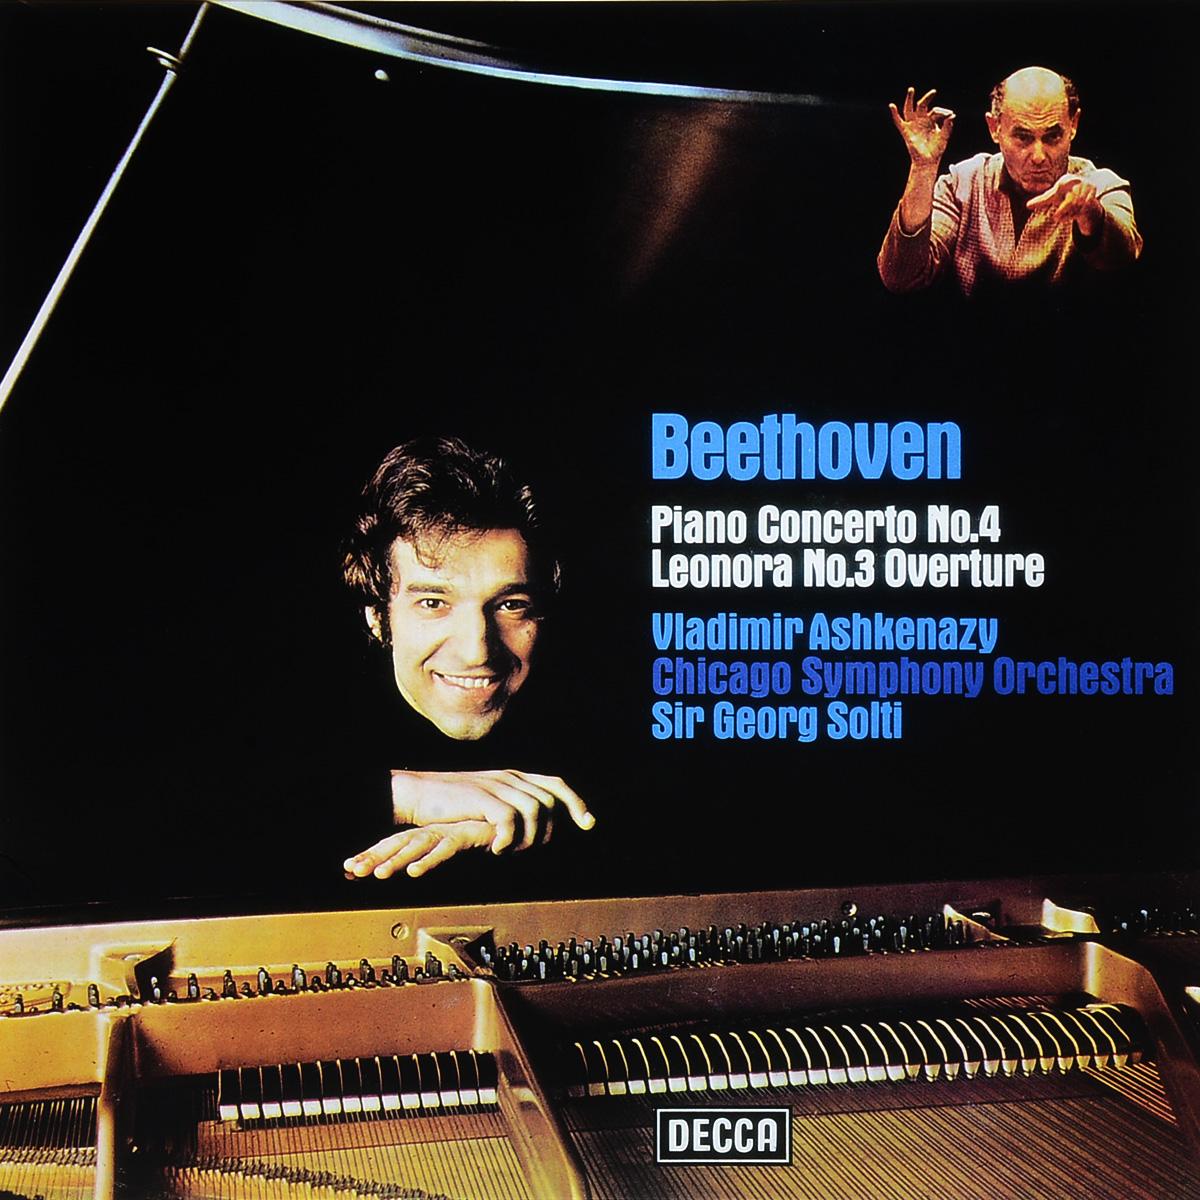 Ashkenazy, Vladimir Beethoven: Piano Concerto No.4. Overture Leonore No.3 (LP) vladimir ashkenazy beethoven the piano concertos 3 cd